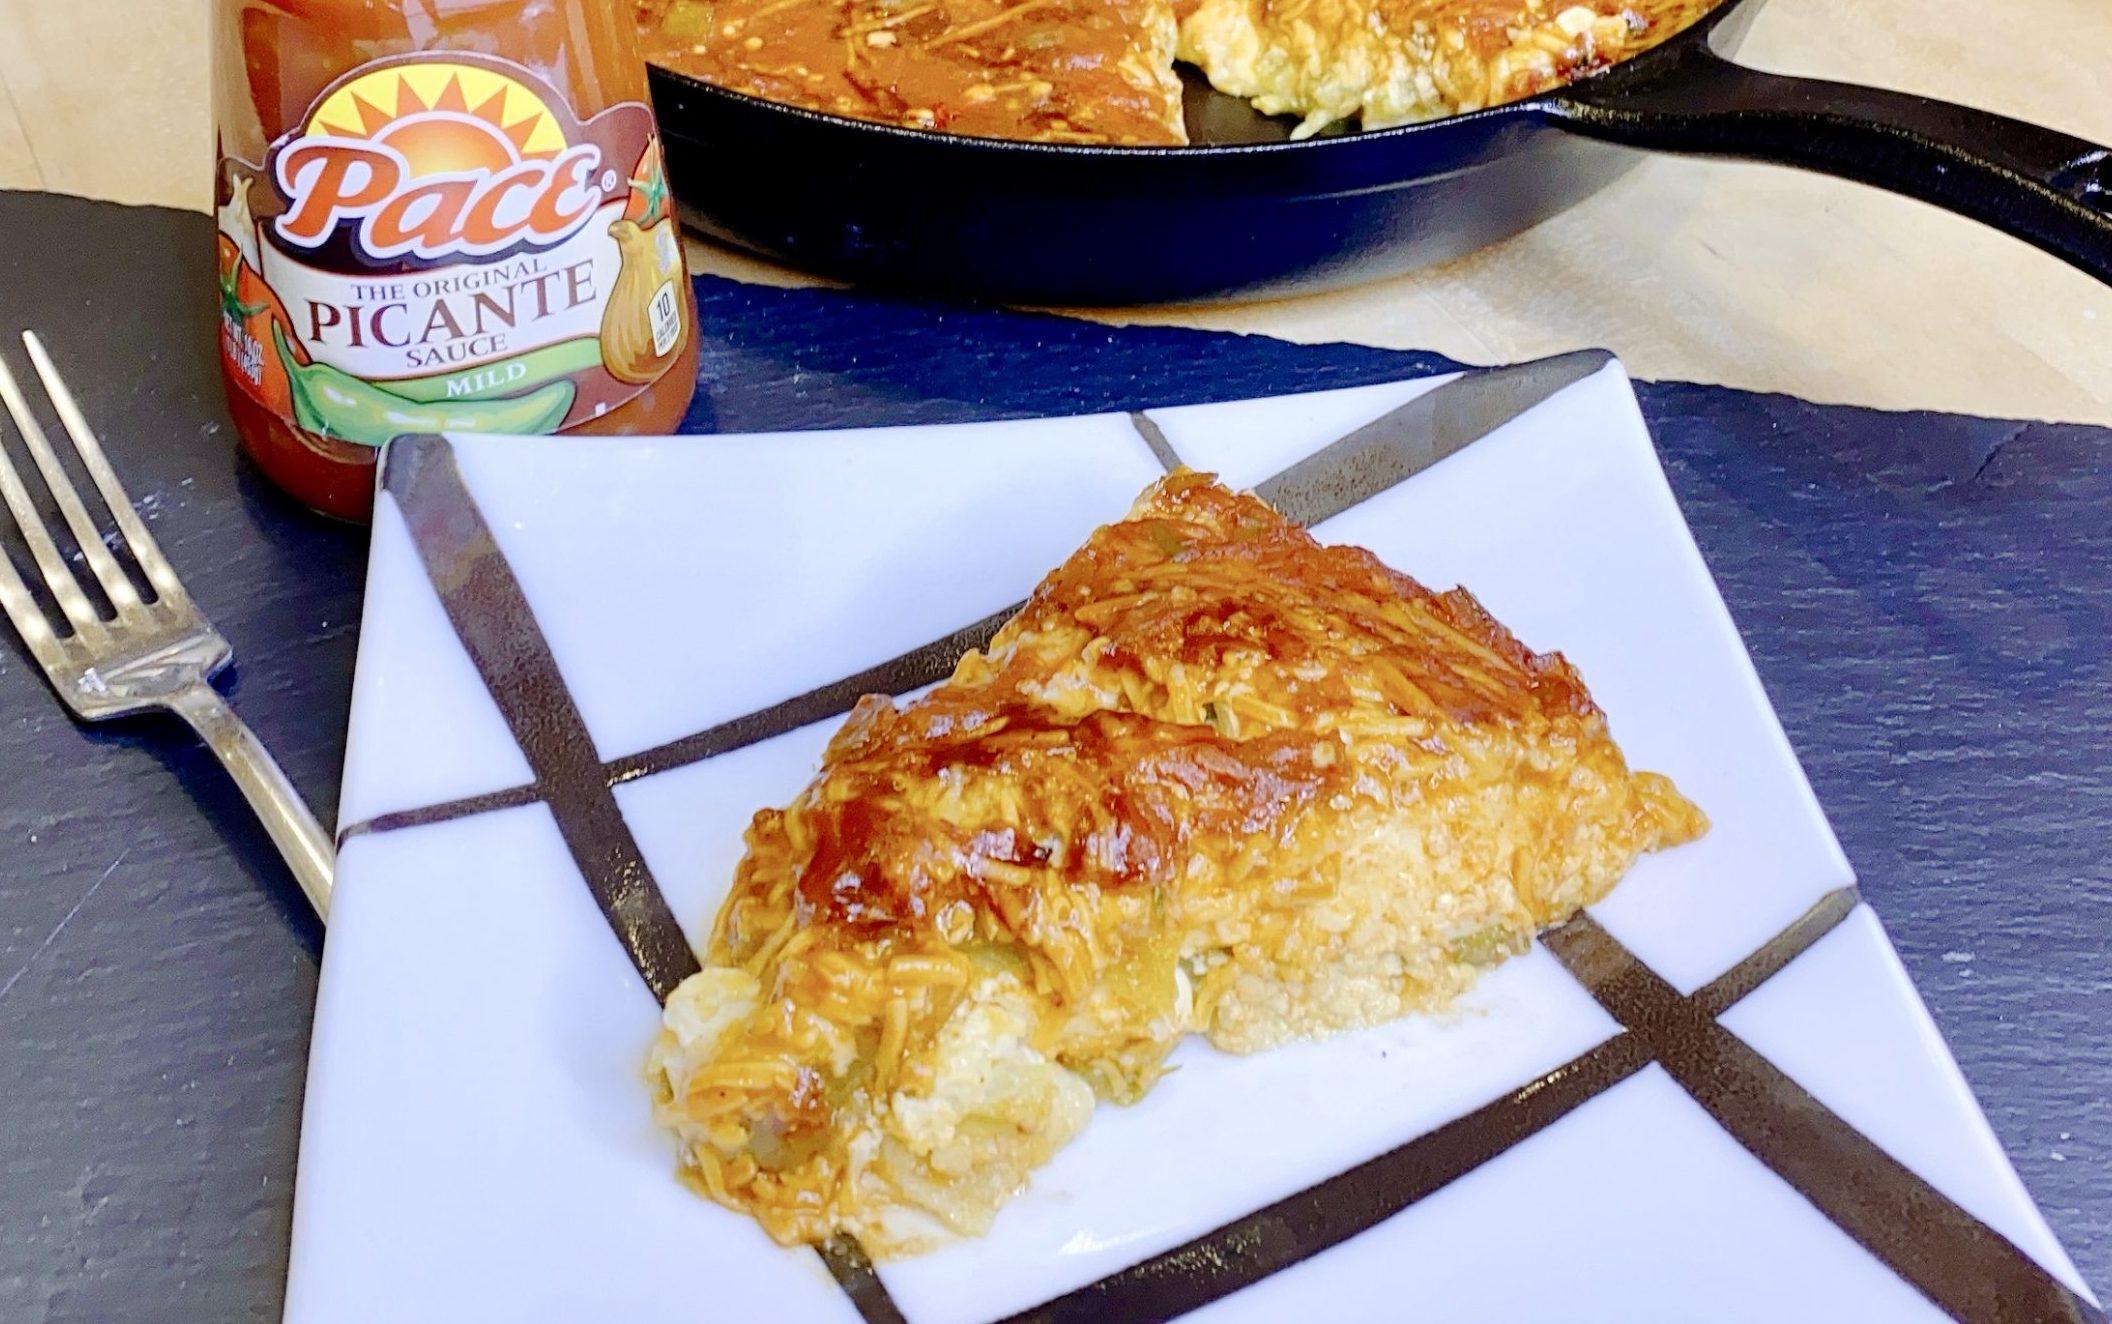 Cheesy Chile Relleno Casserole with Pace® Picante Sauce